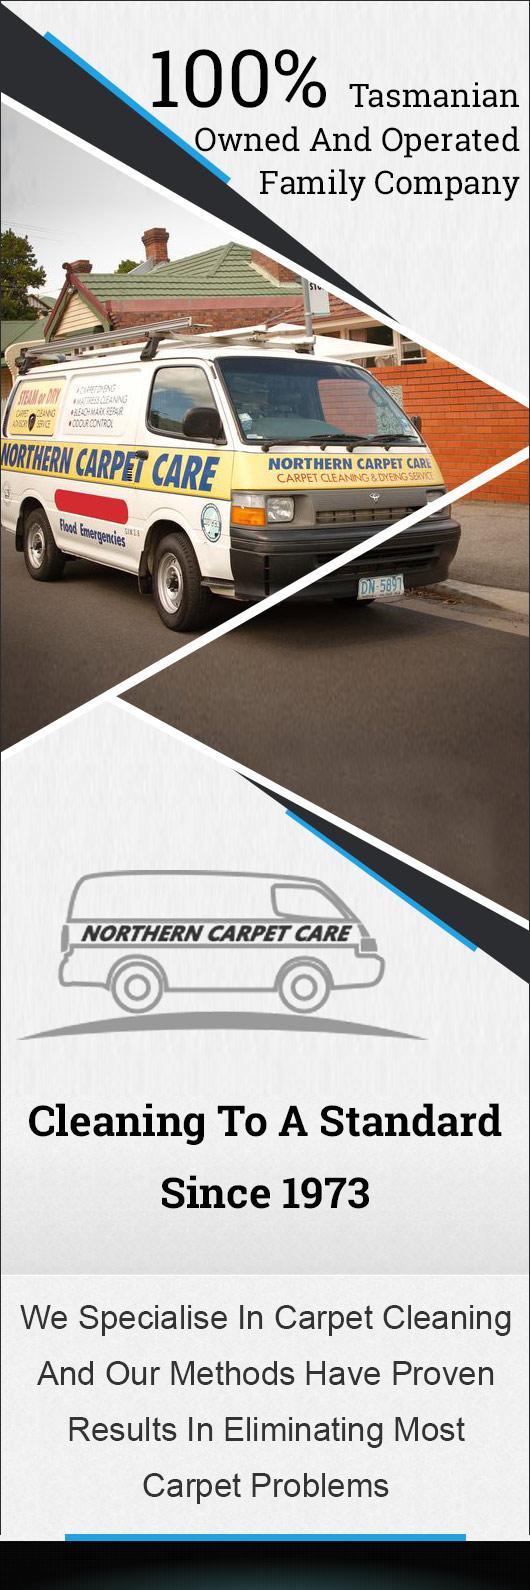 Northern carpet care promotion